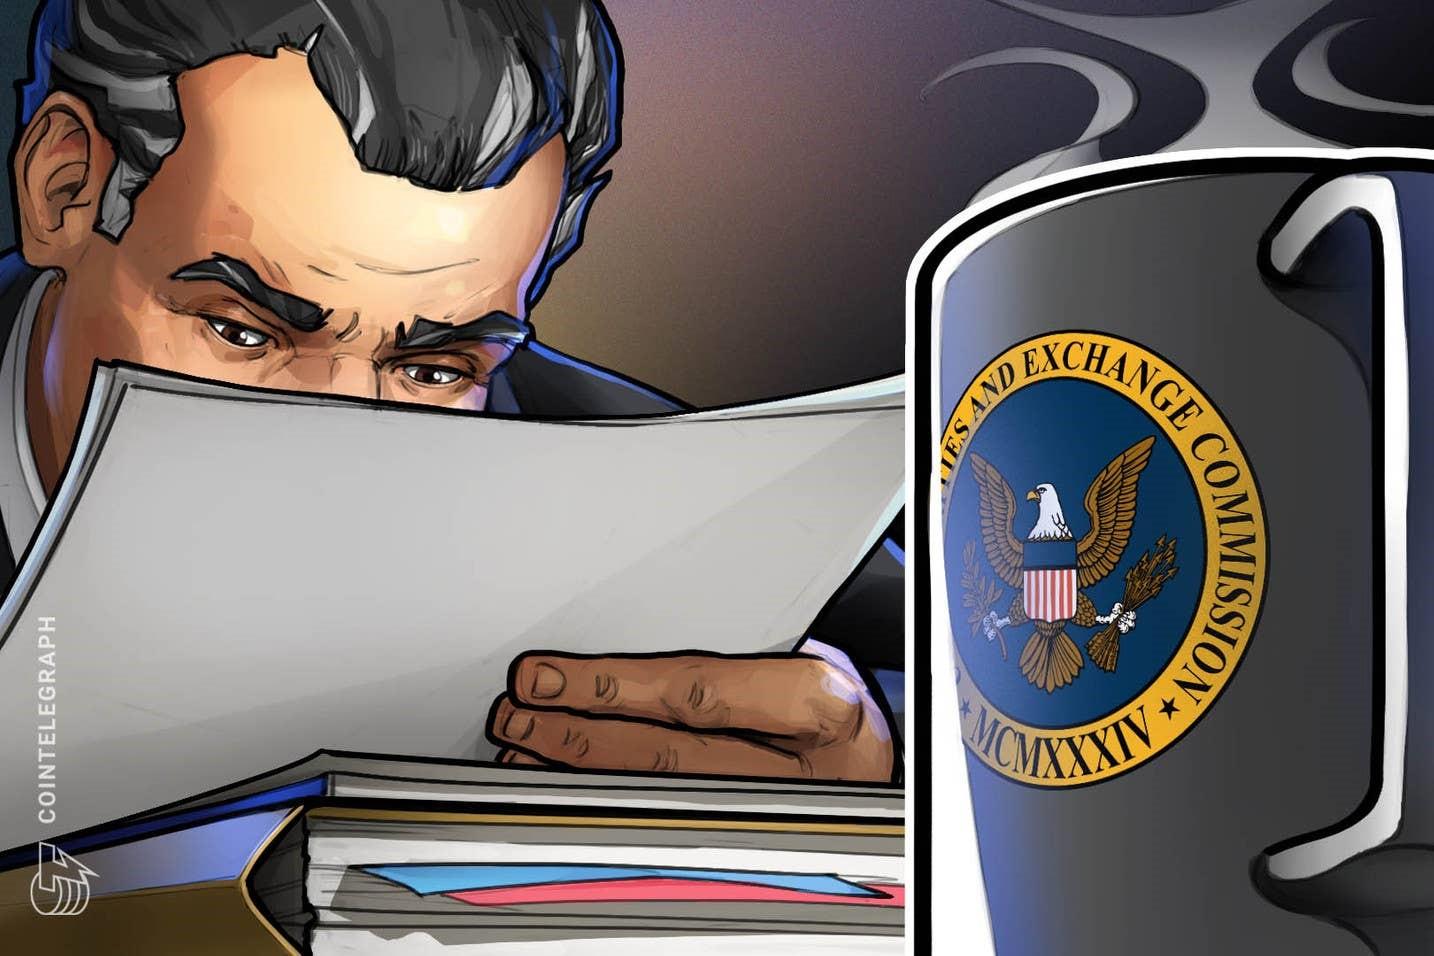 SEC ایالات متحده هشدار جدید سرمایه گذاران را در مورد کلاهبرداری های سرمایه گذاری رمزارز را منتشر کرد